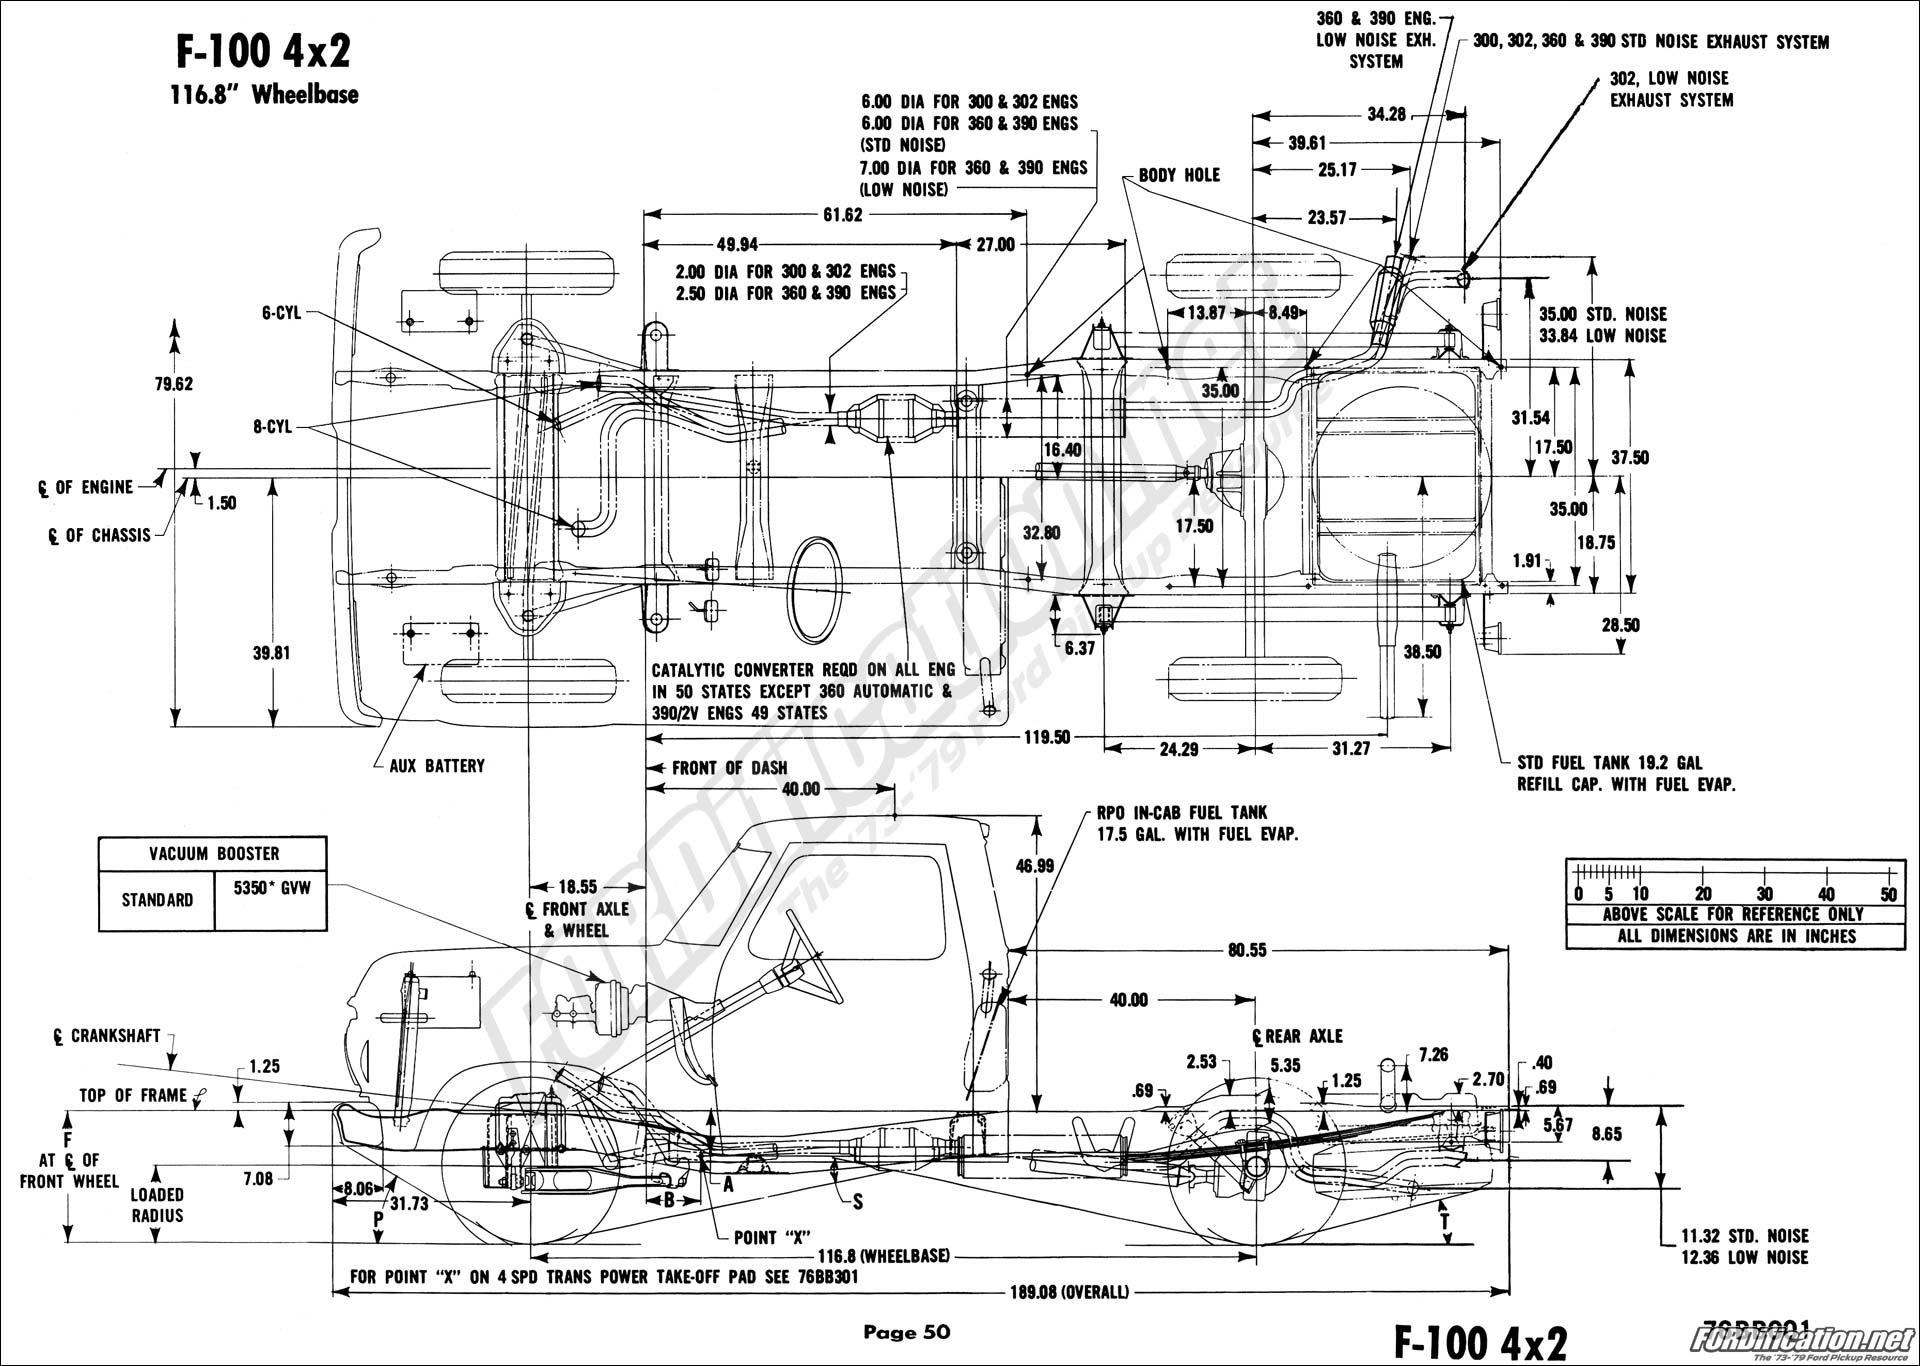 lada schema moteur monophase